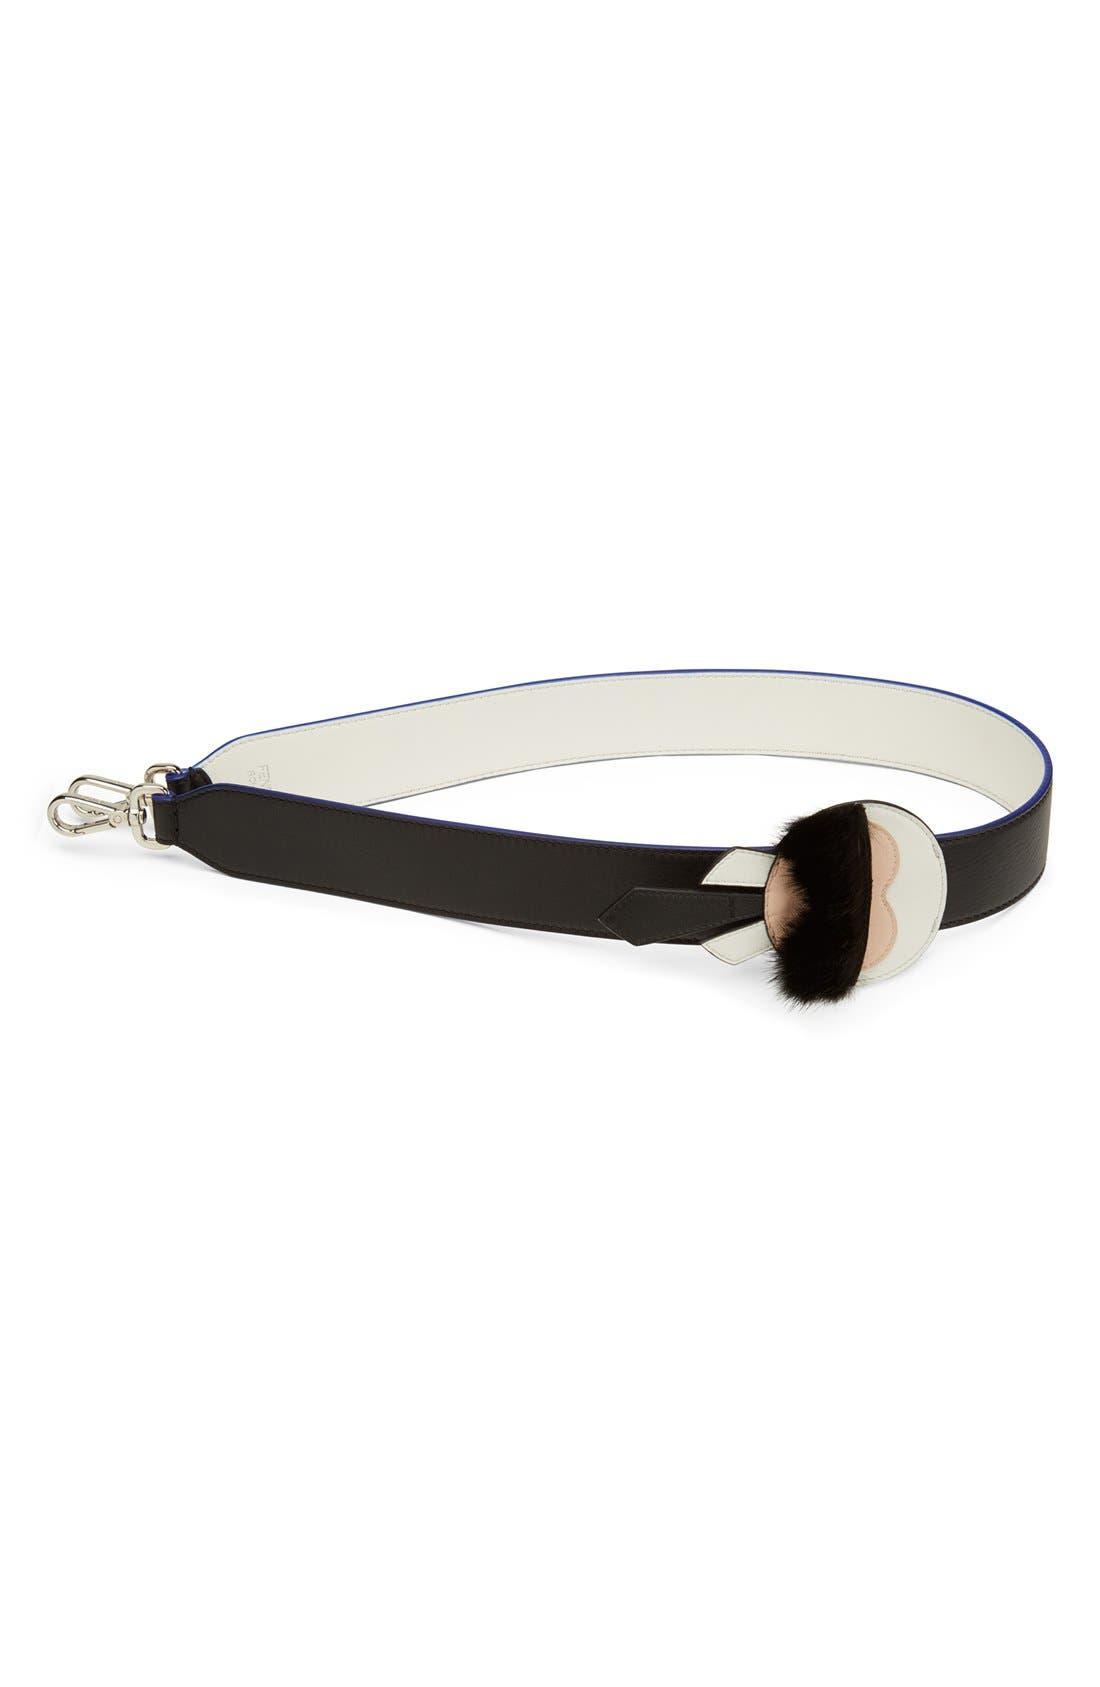 Main Image - Fendi 'Strap You - Karlito' Leather & Genuine Mink Fur Bag Strap